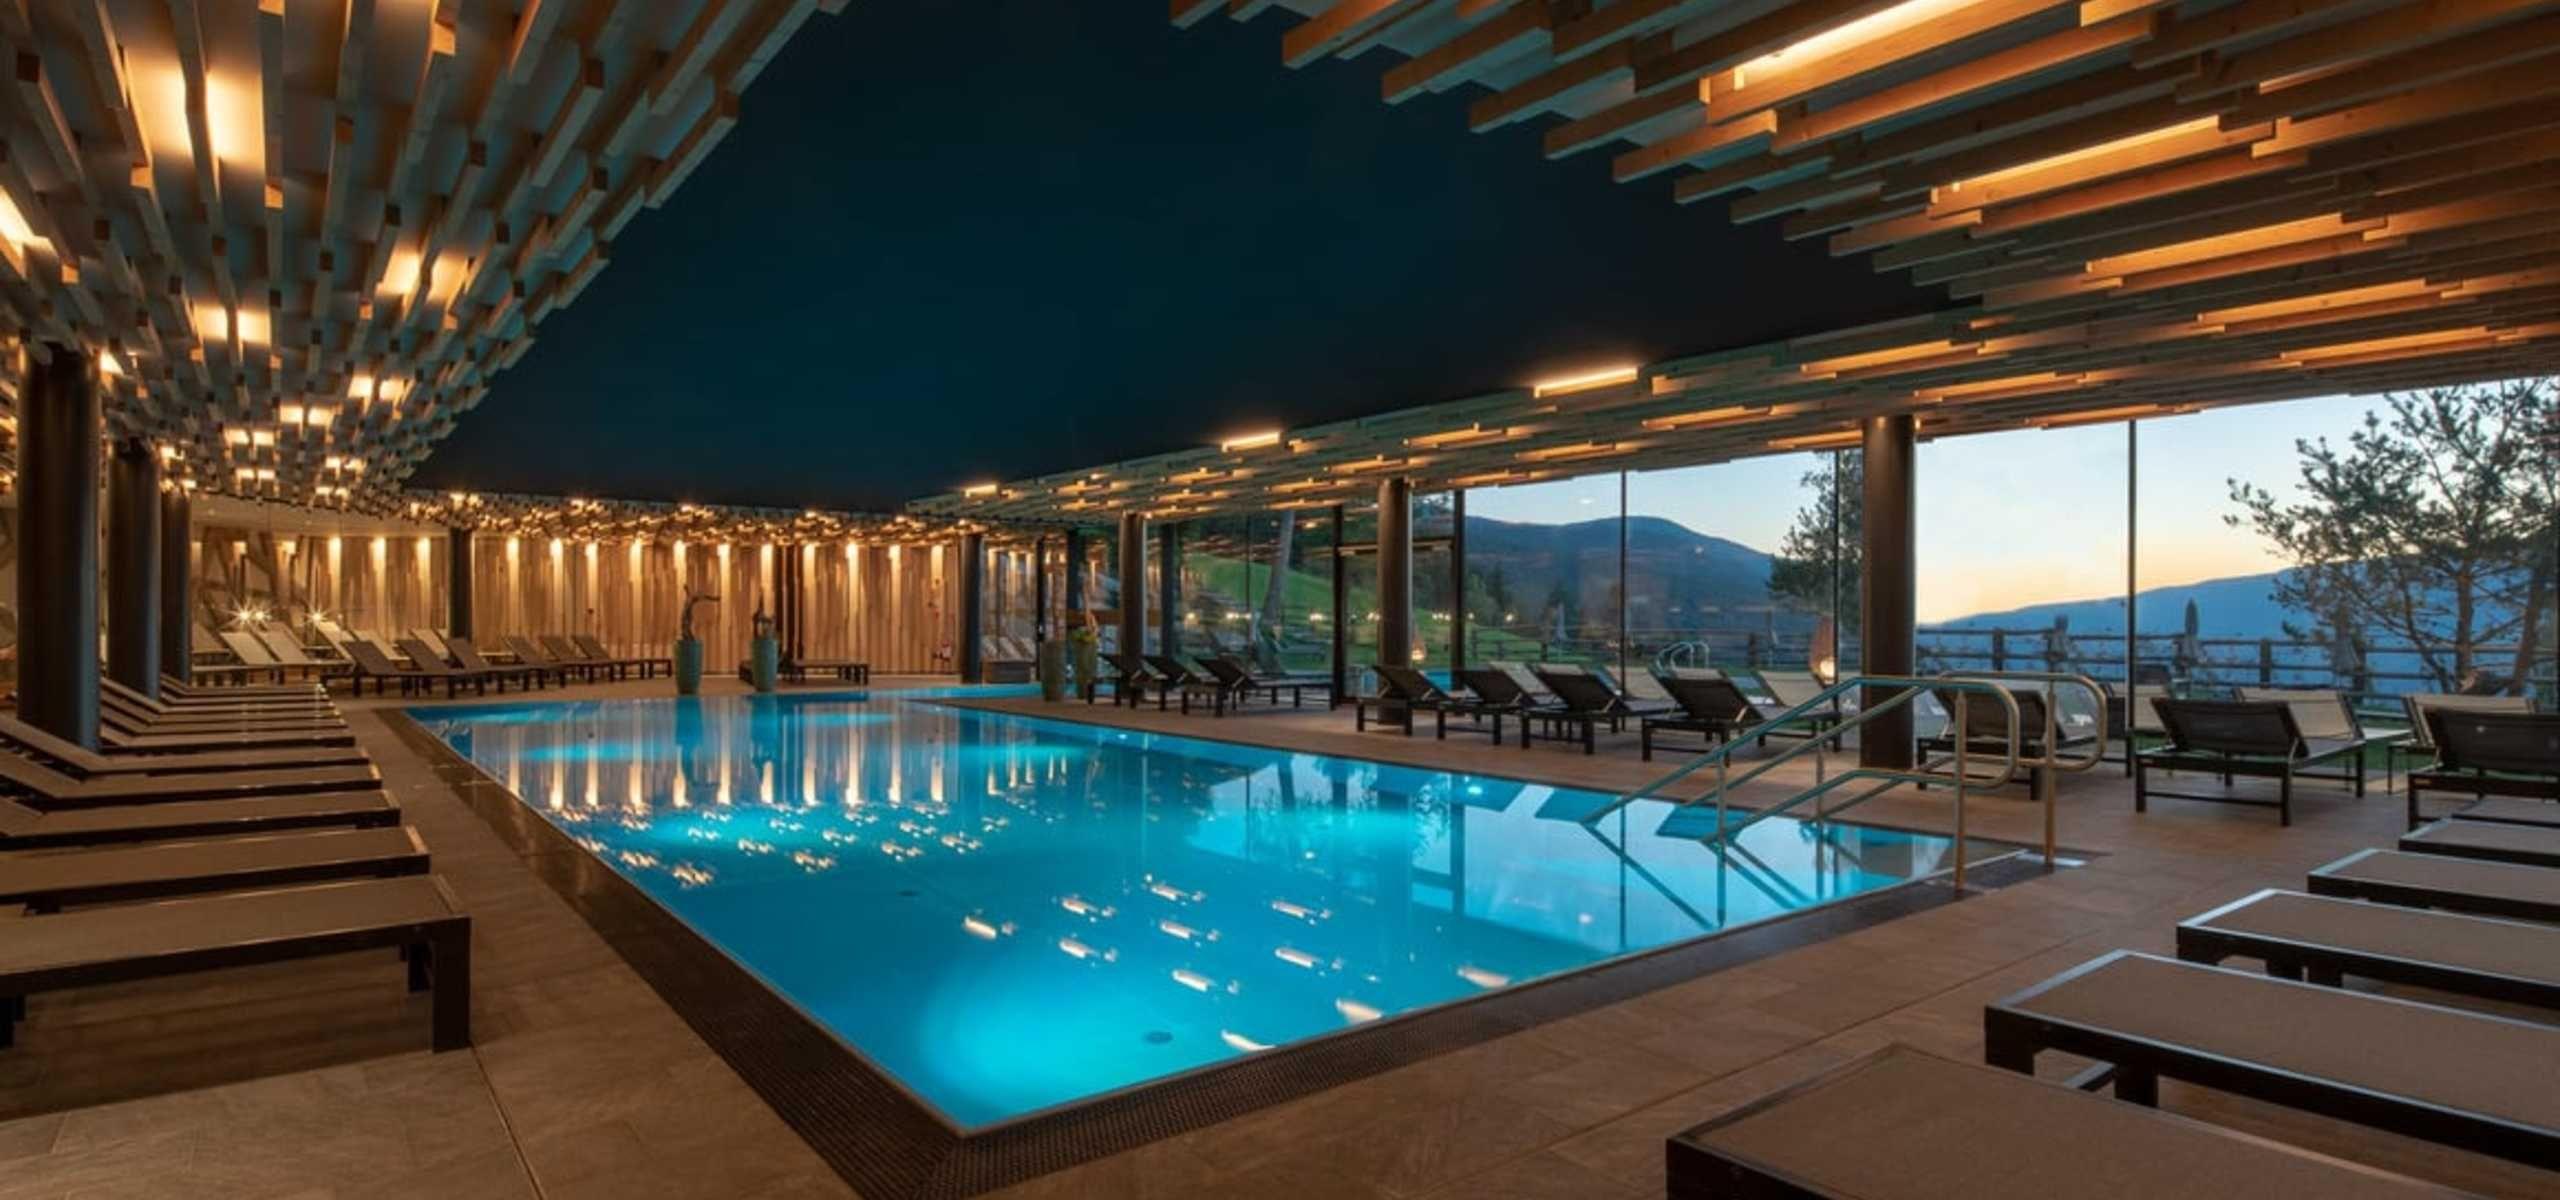 Brixen Wellnesshotel in 2020 Wellnesshotel, Outdoor